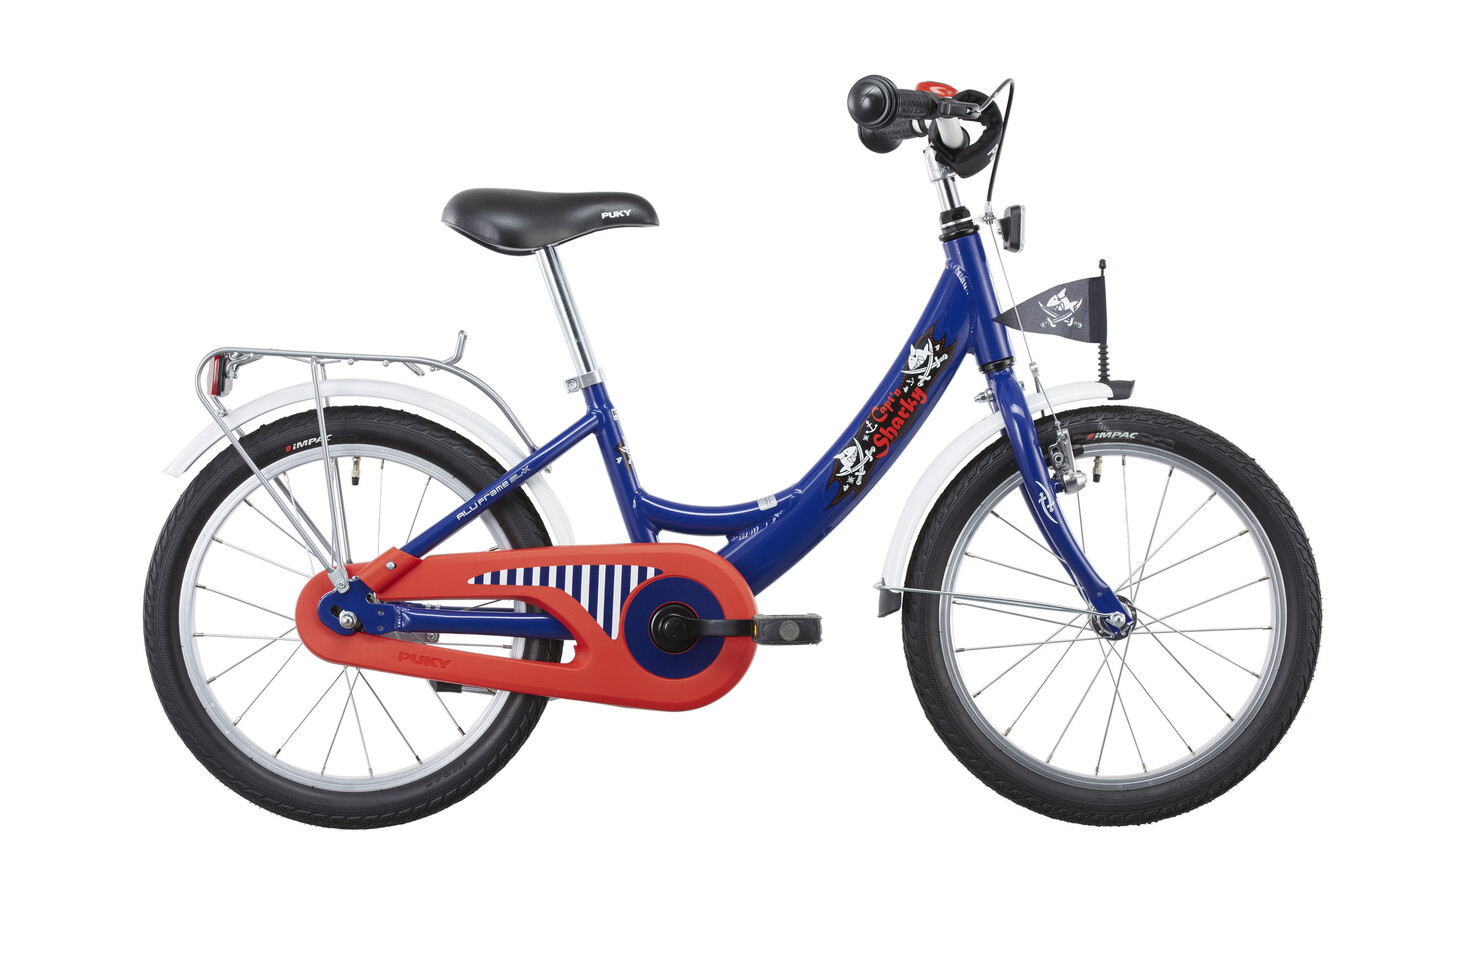 preisvergleich eu kinderfahrrad fahrrad 18 zoll. Black Bedroom Furniture Sets. Home Design Ideas